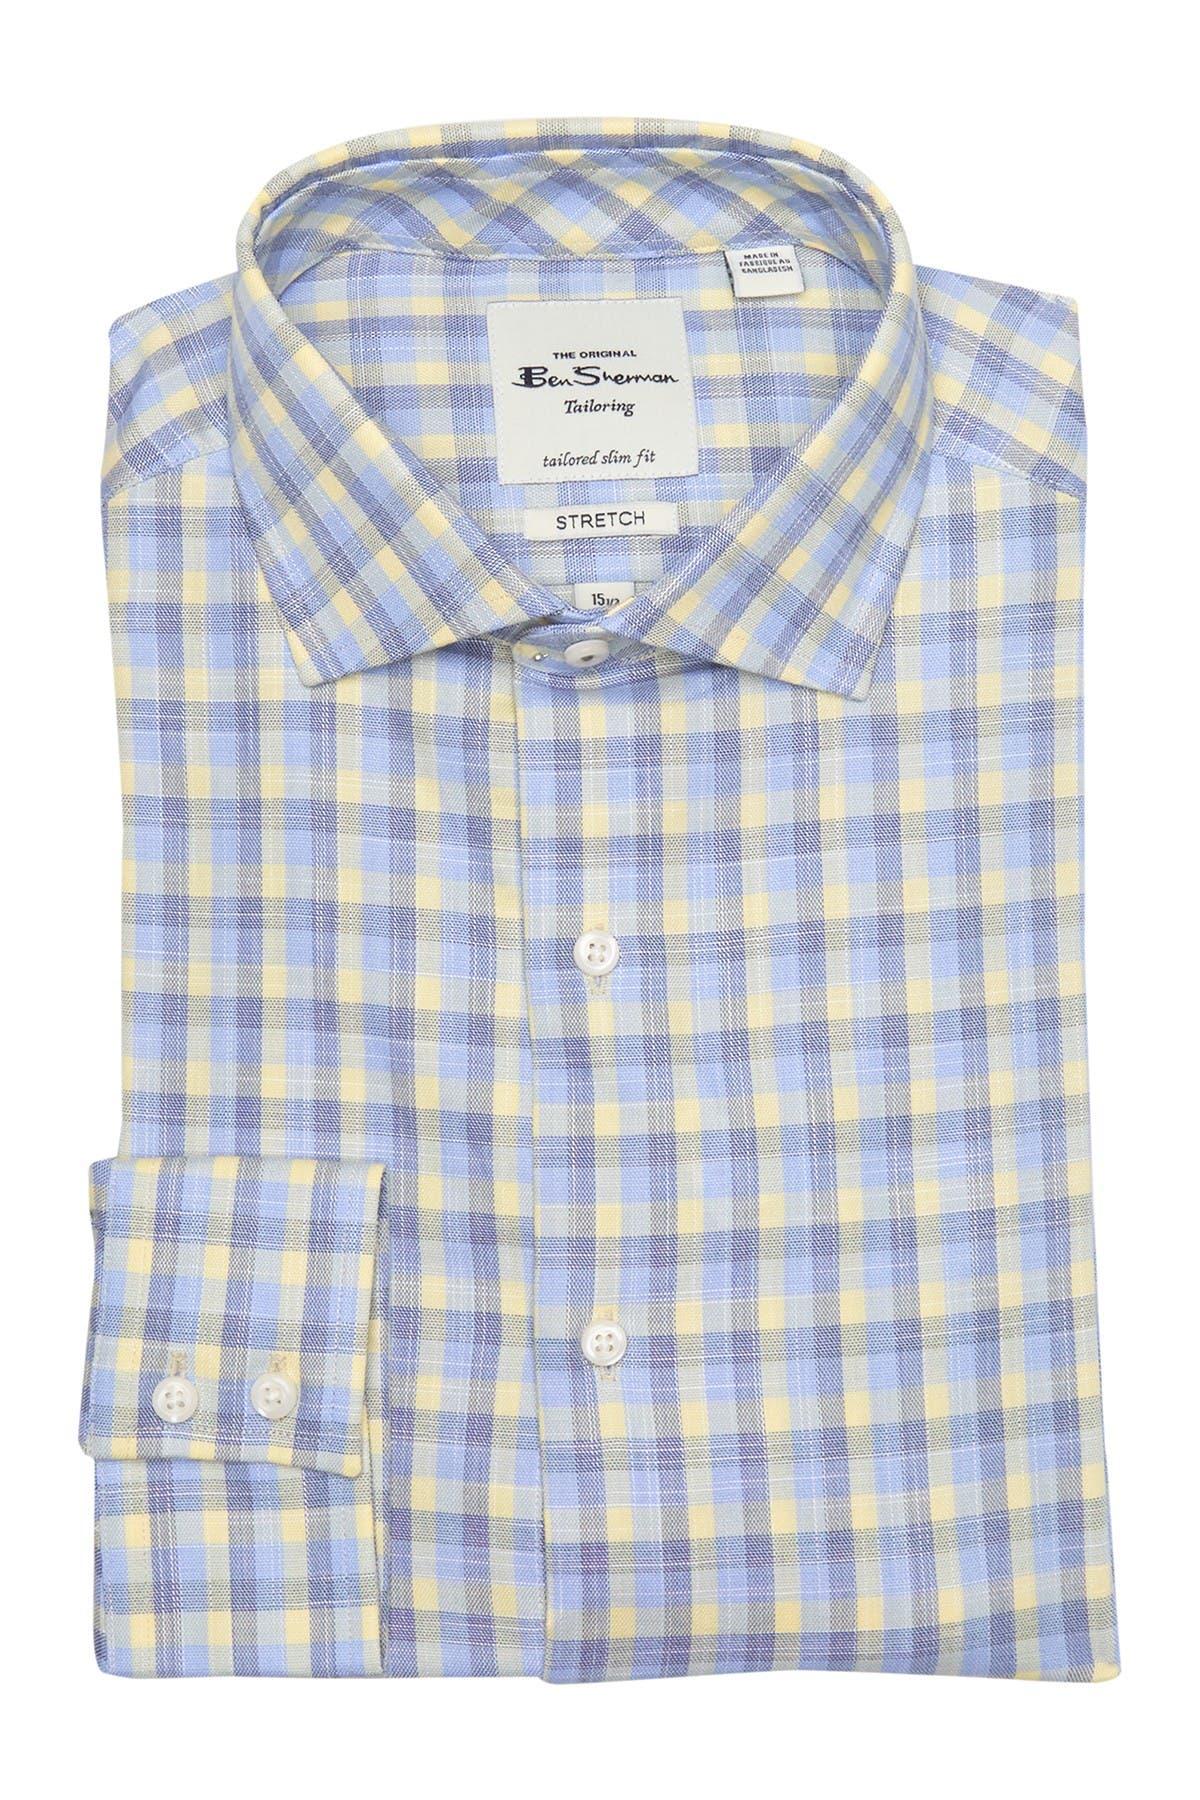 Image of Ben Sherman Yellow & Blue Slub Check Dress Shirt